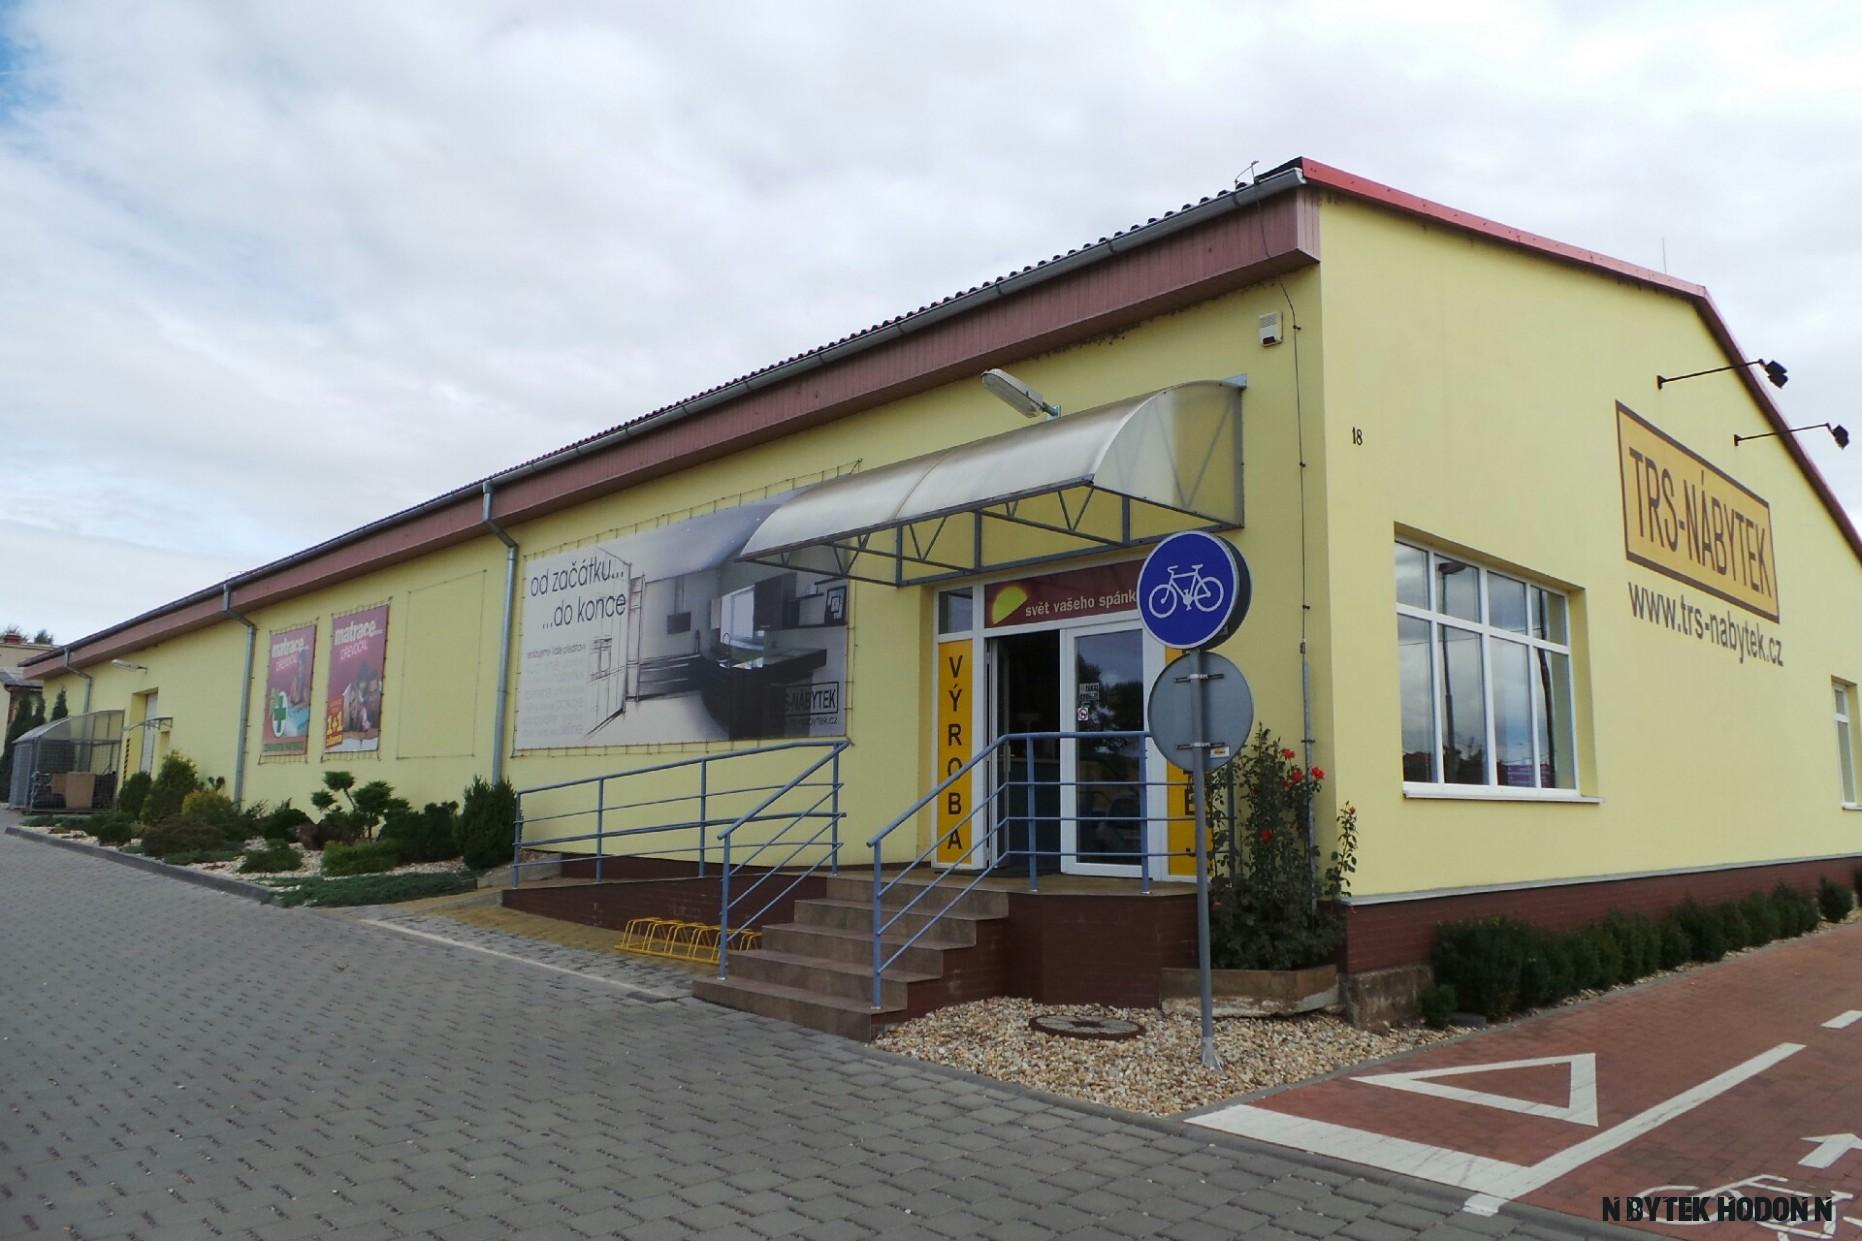 Trs - Nábytek (Hodonín) • Firmy.cz